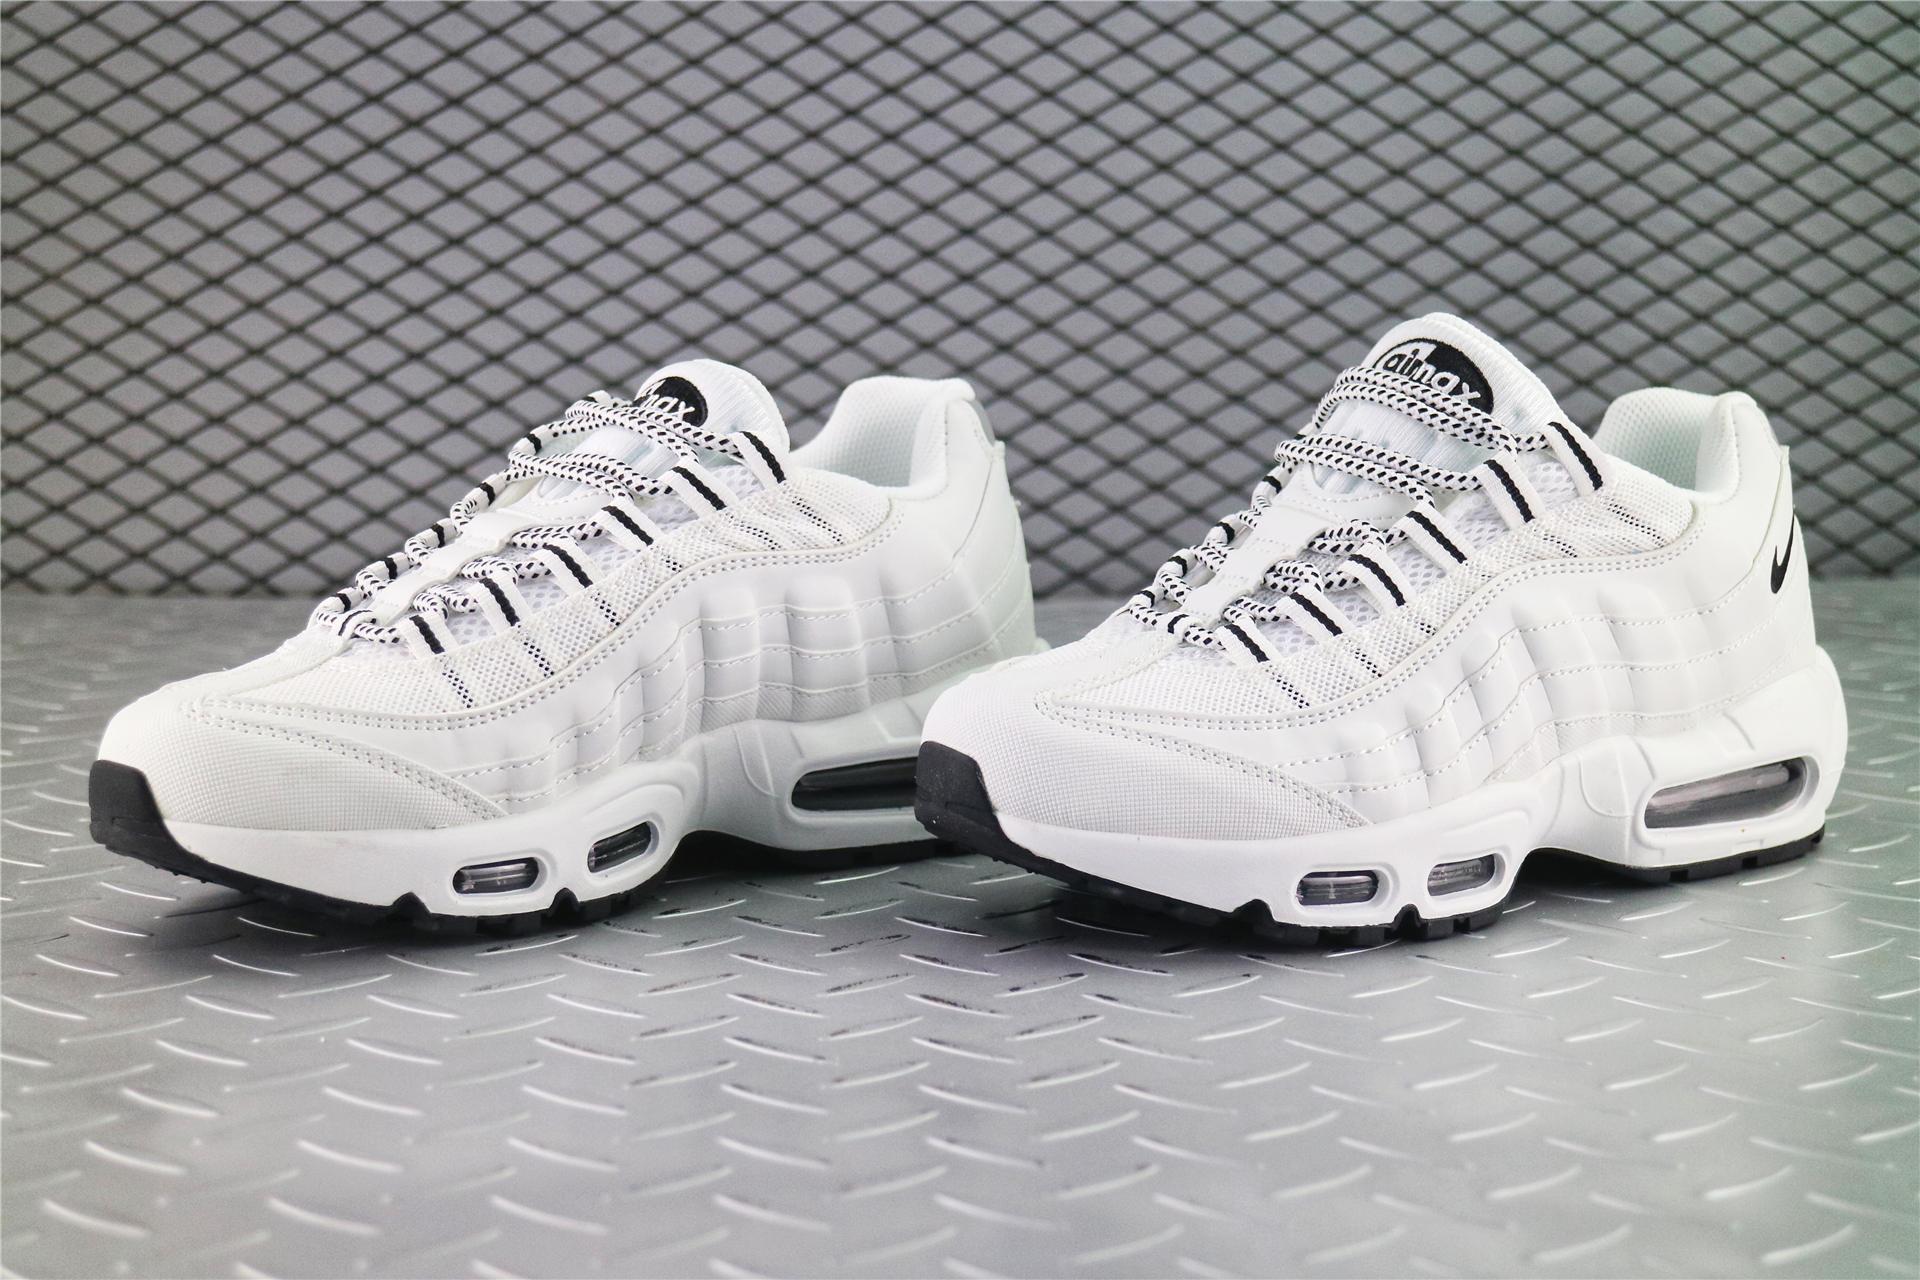 52171ddc87c1 Купить мужские кроссовки Nike Air Max 95 White   Black   Black в ...